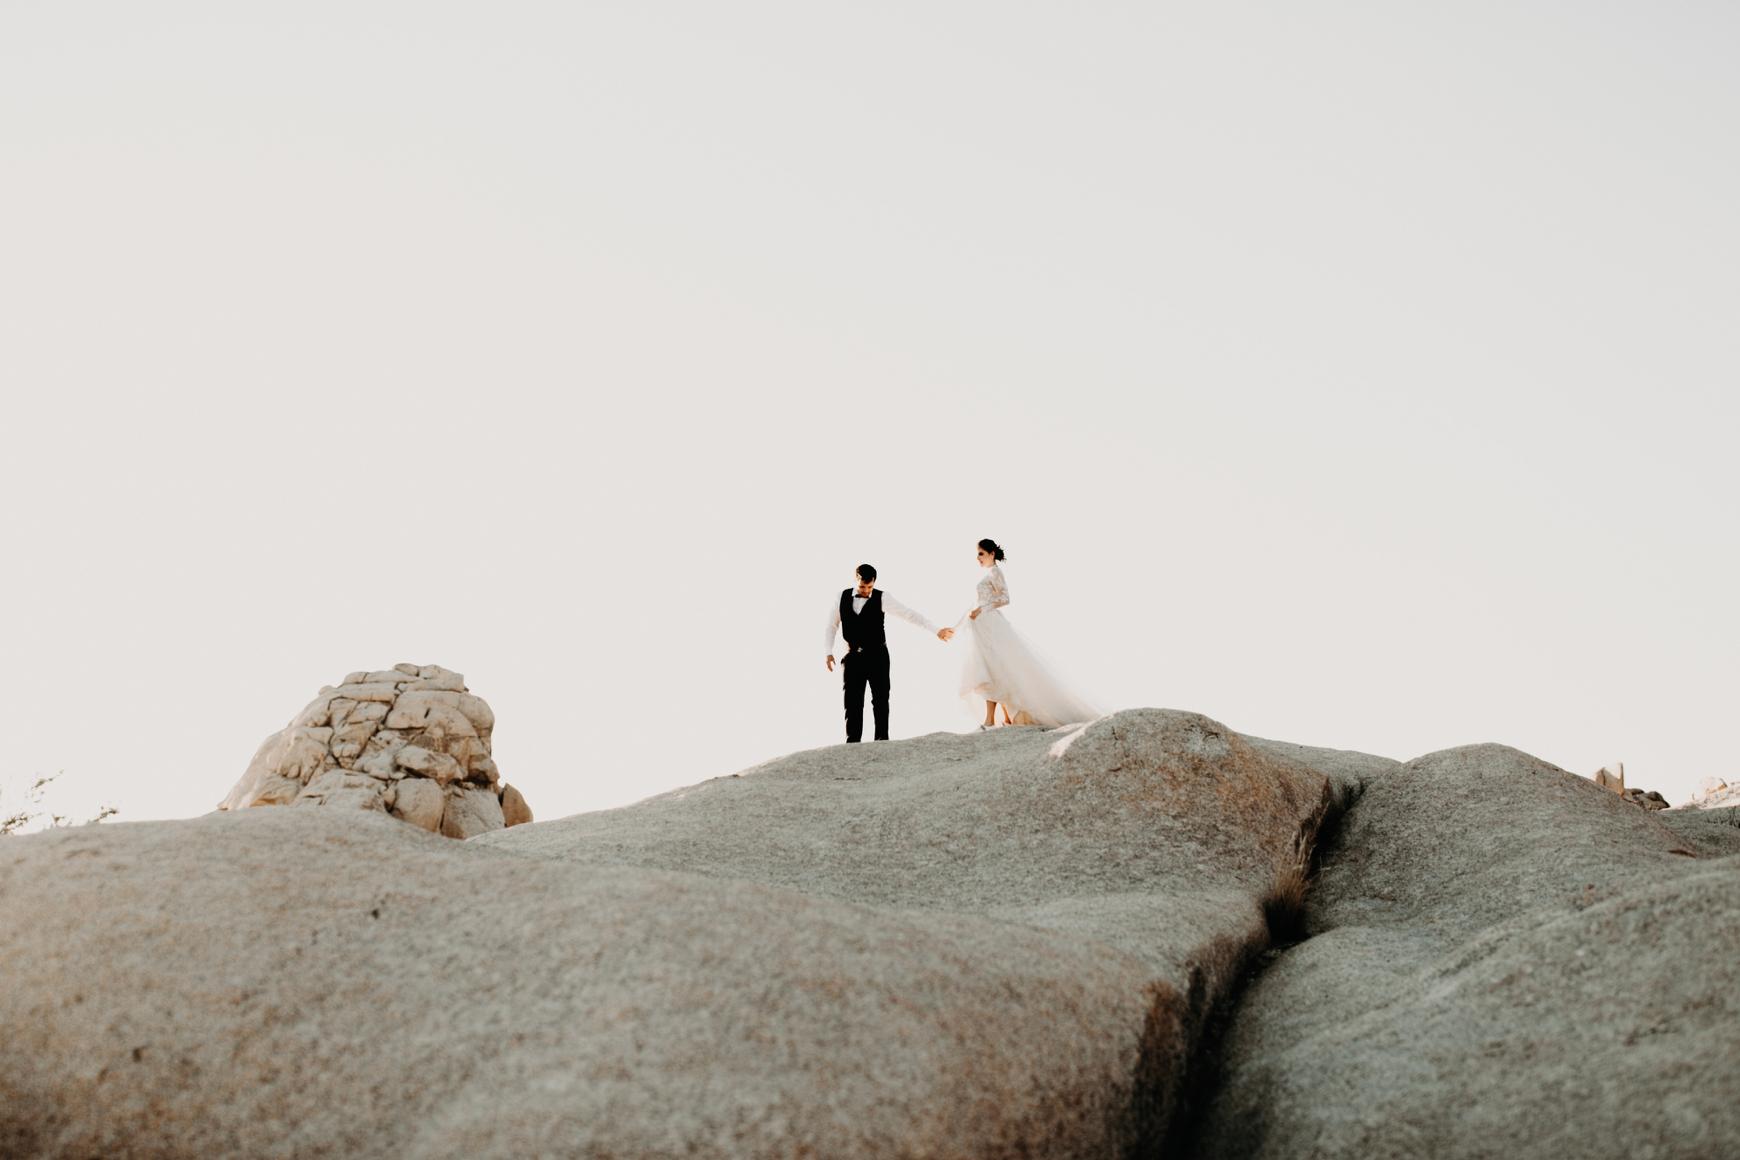 Joshua Tree Bridal Portraits Anastasia & Andrey Emily Magers Photography-252.jpg